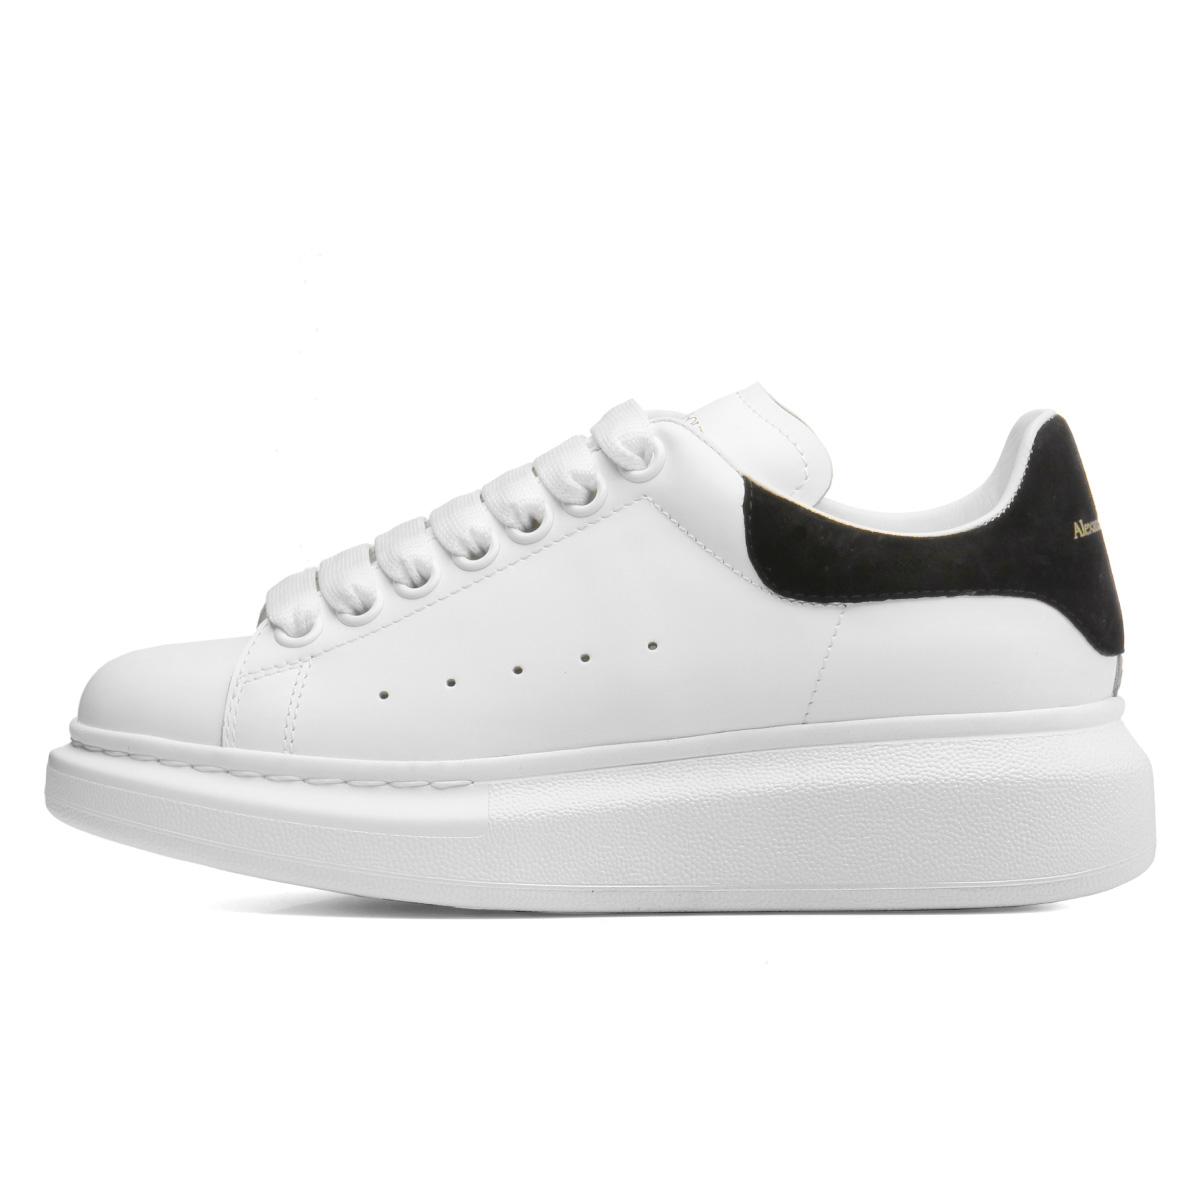 Alexander McQueen ALEXANDER McQUEEN shoes Lady's 553770 WHGP7 9061 sneakers  WHITE/BLACK white